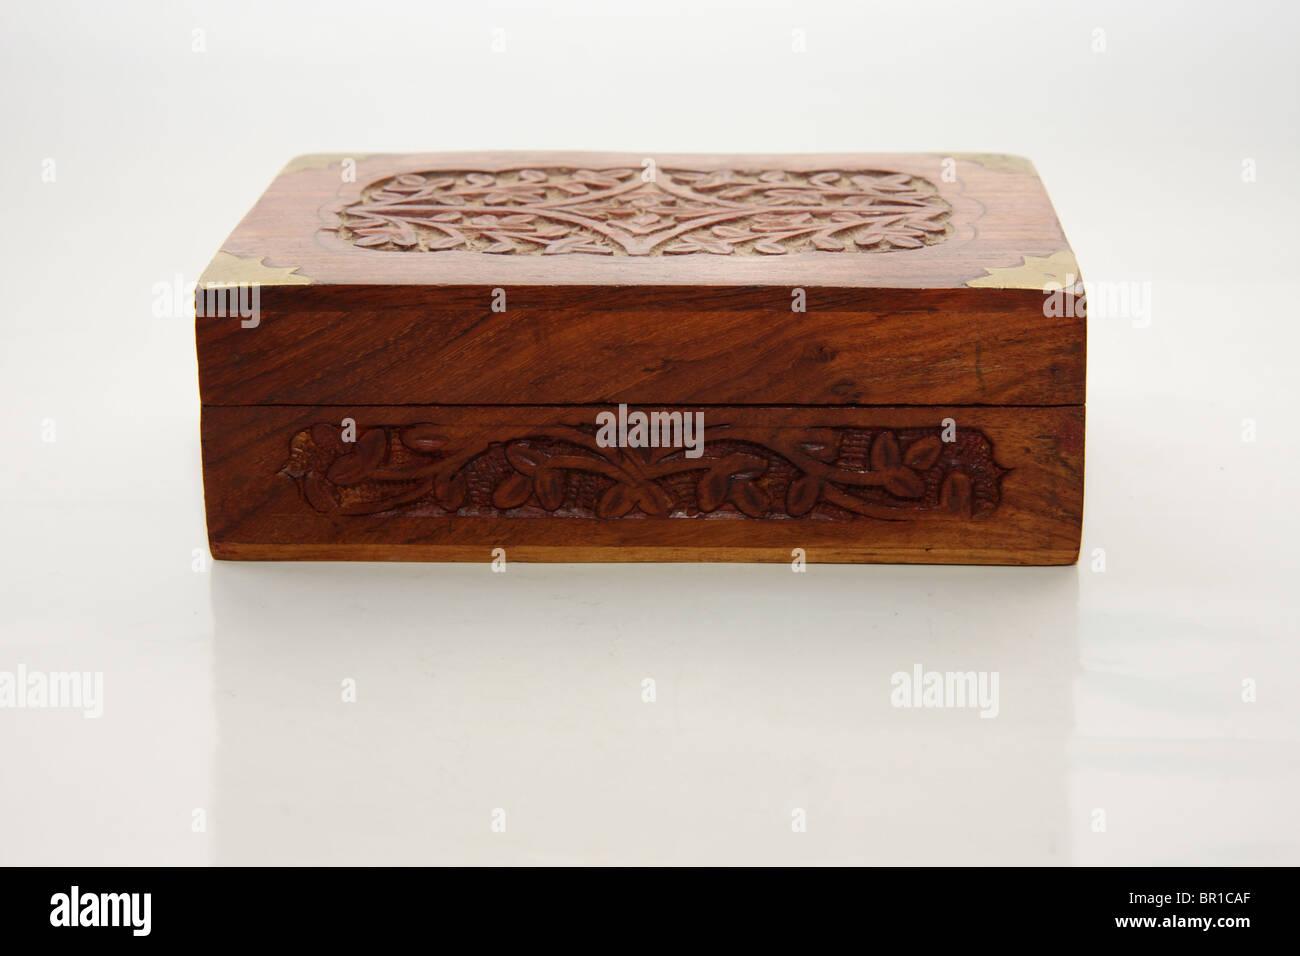 Wooden jewel box - Stock Image